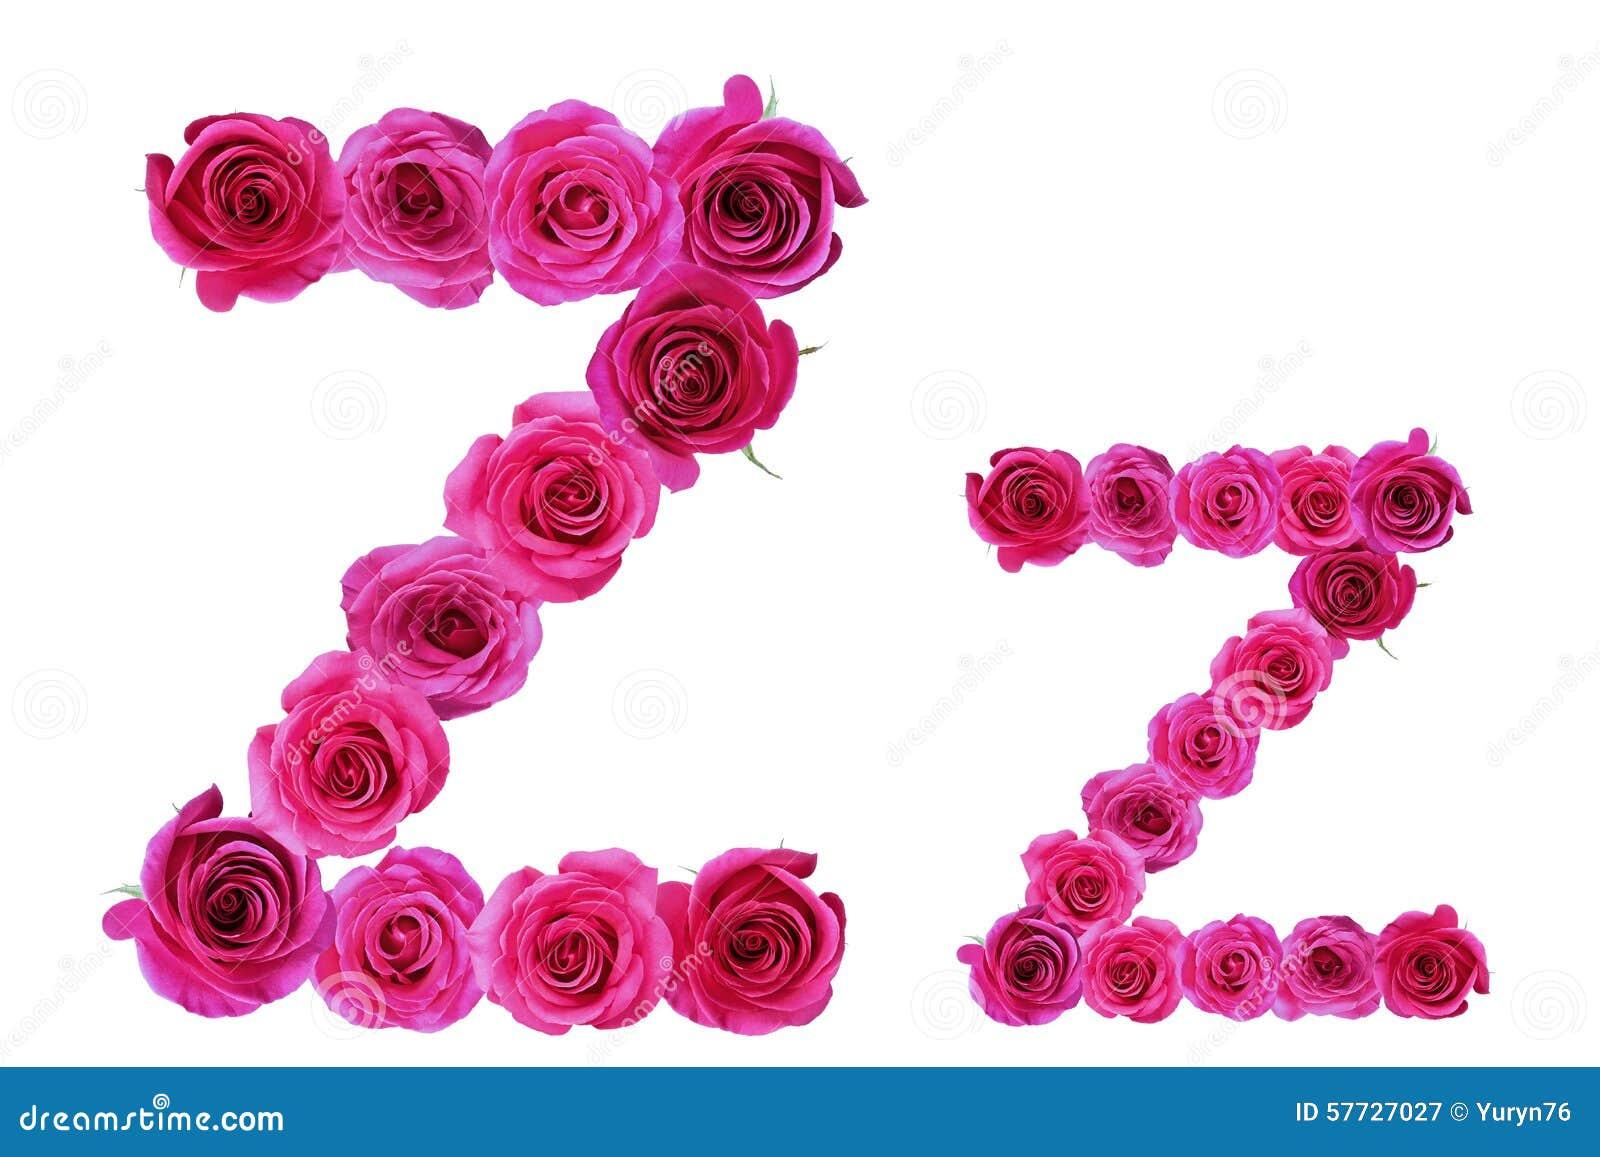 Letter z of roses stock image. Image of symbol, letter ...